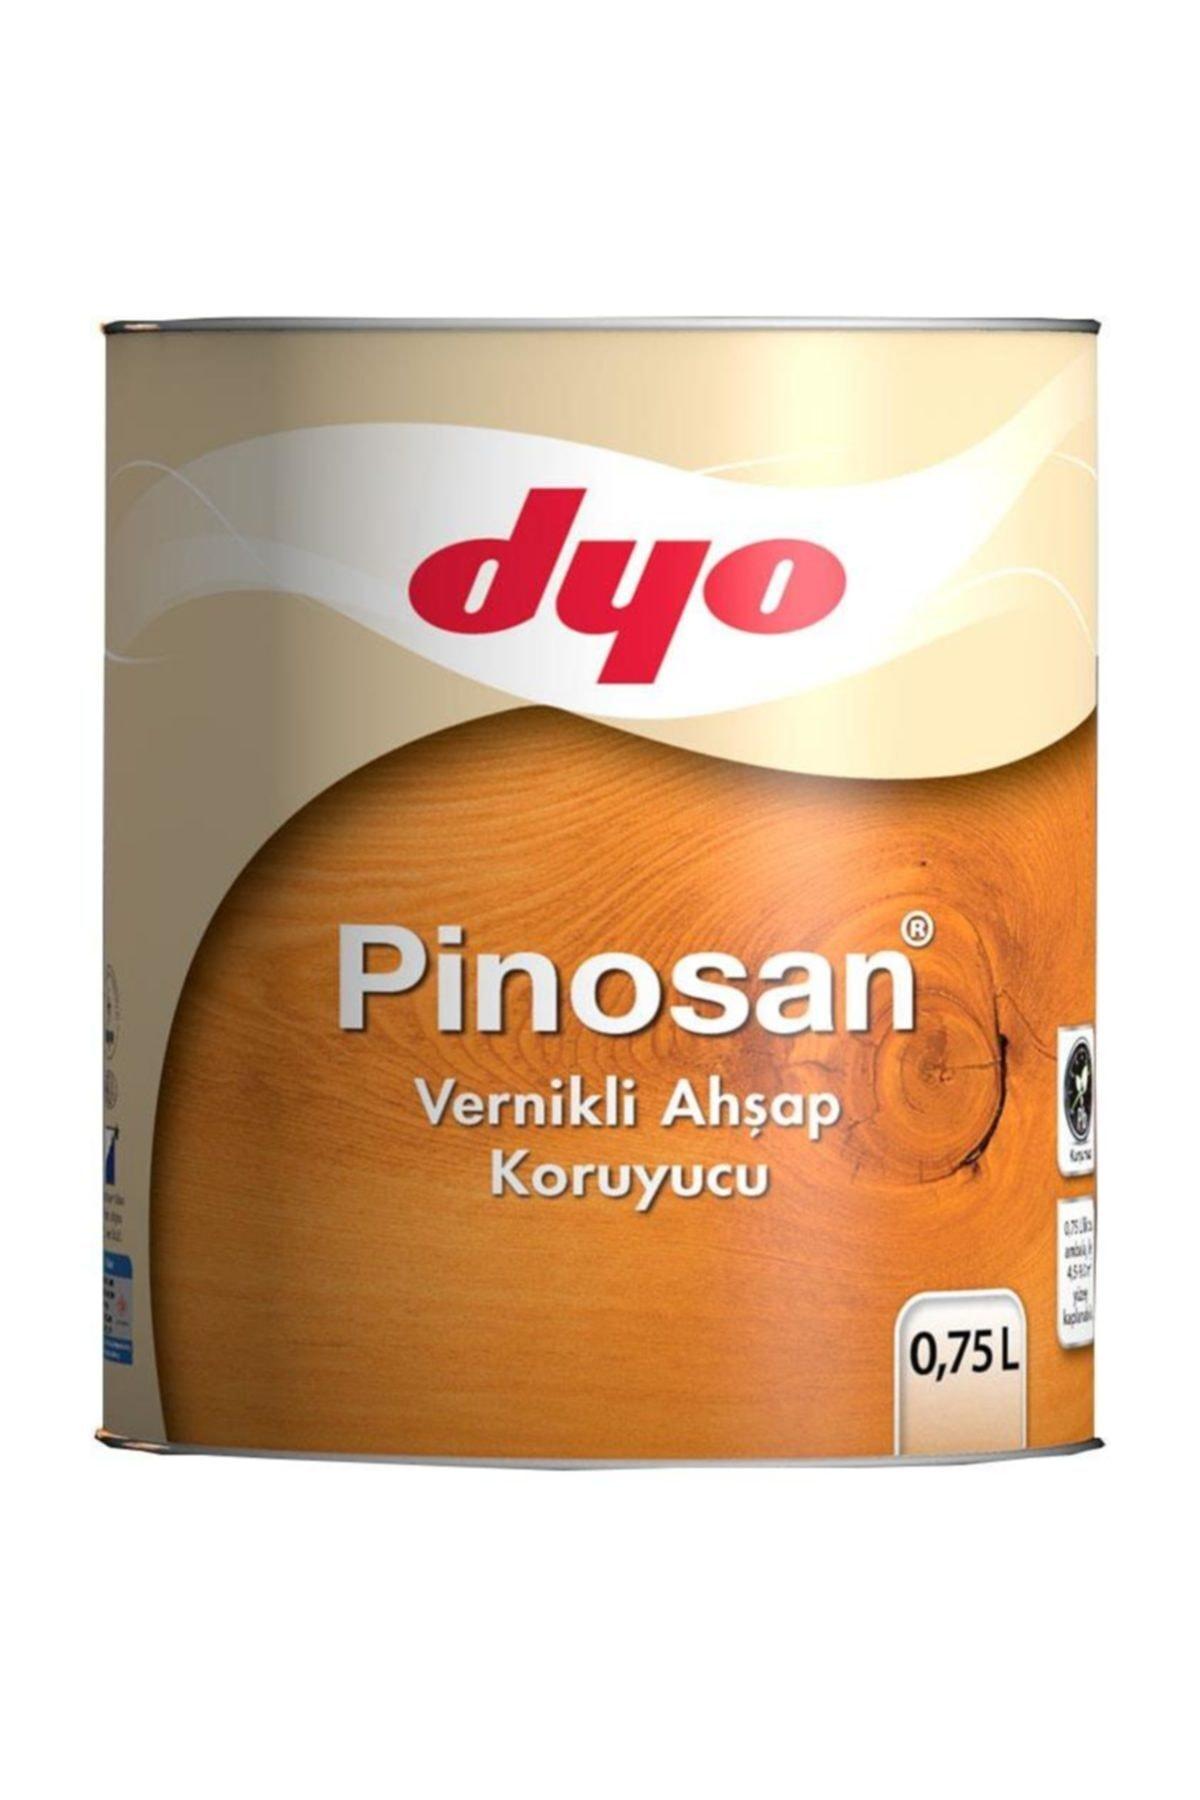 Dyo Pinosan Vernikli Ahşap Kor. 0,75 Lt Tarçın 1